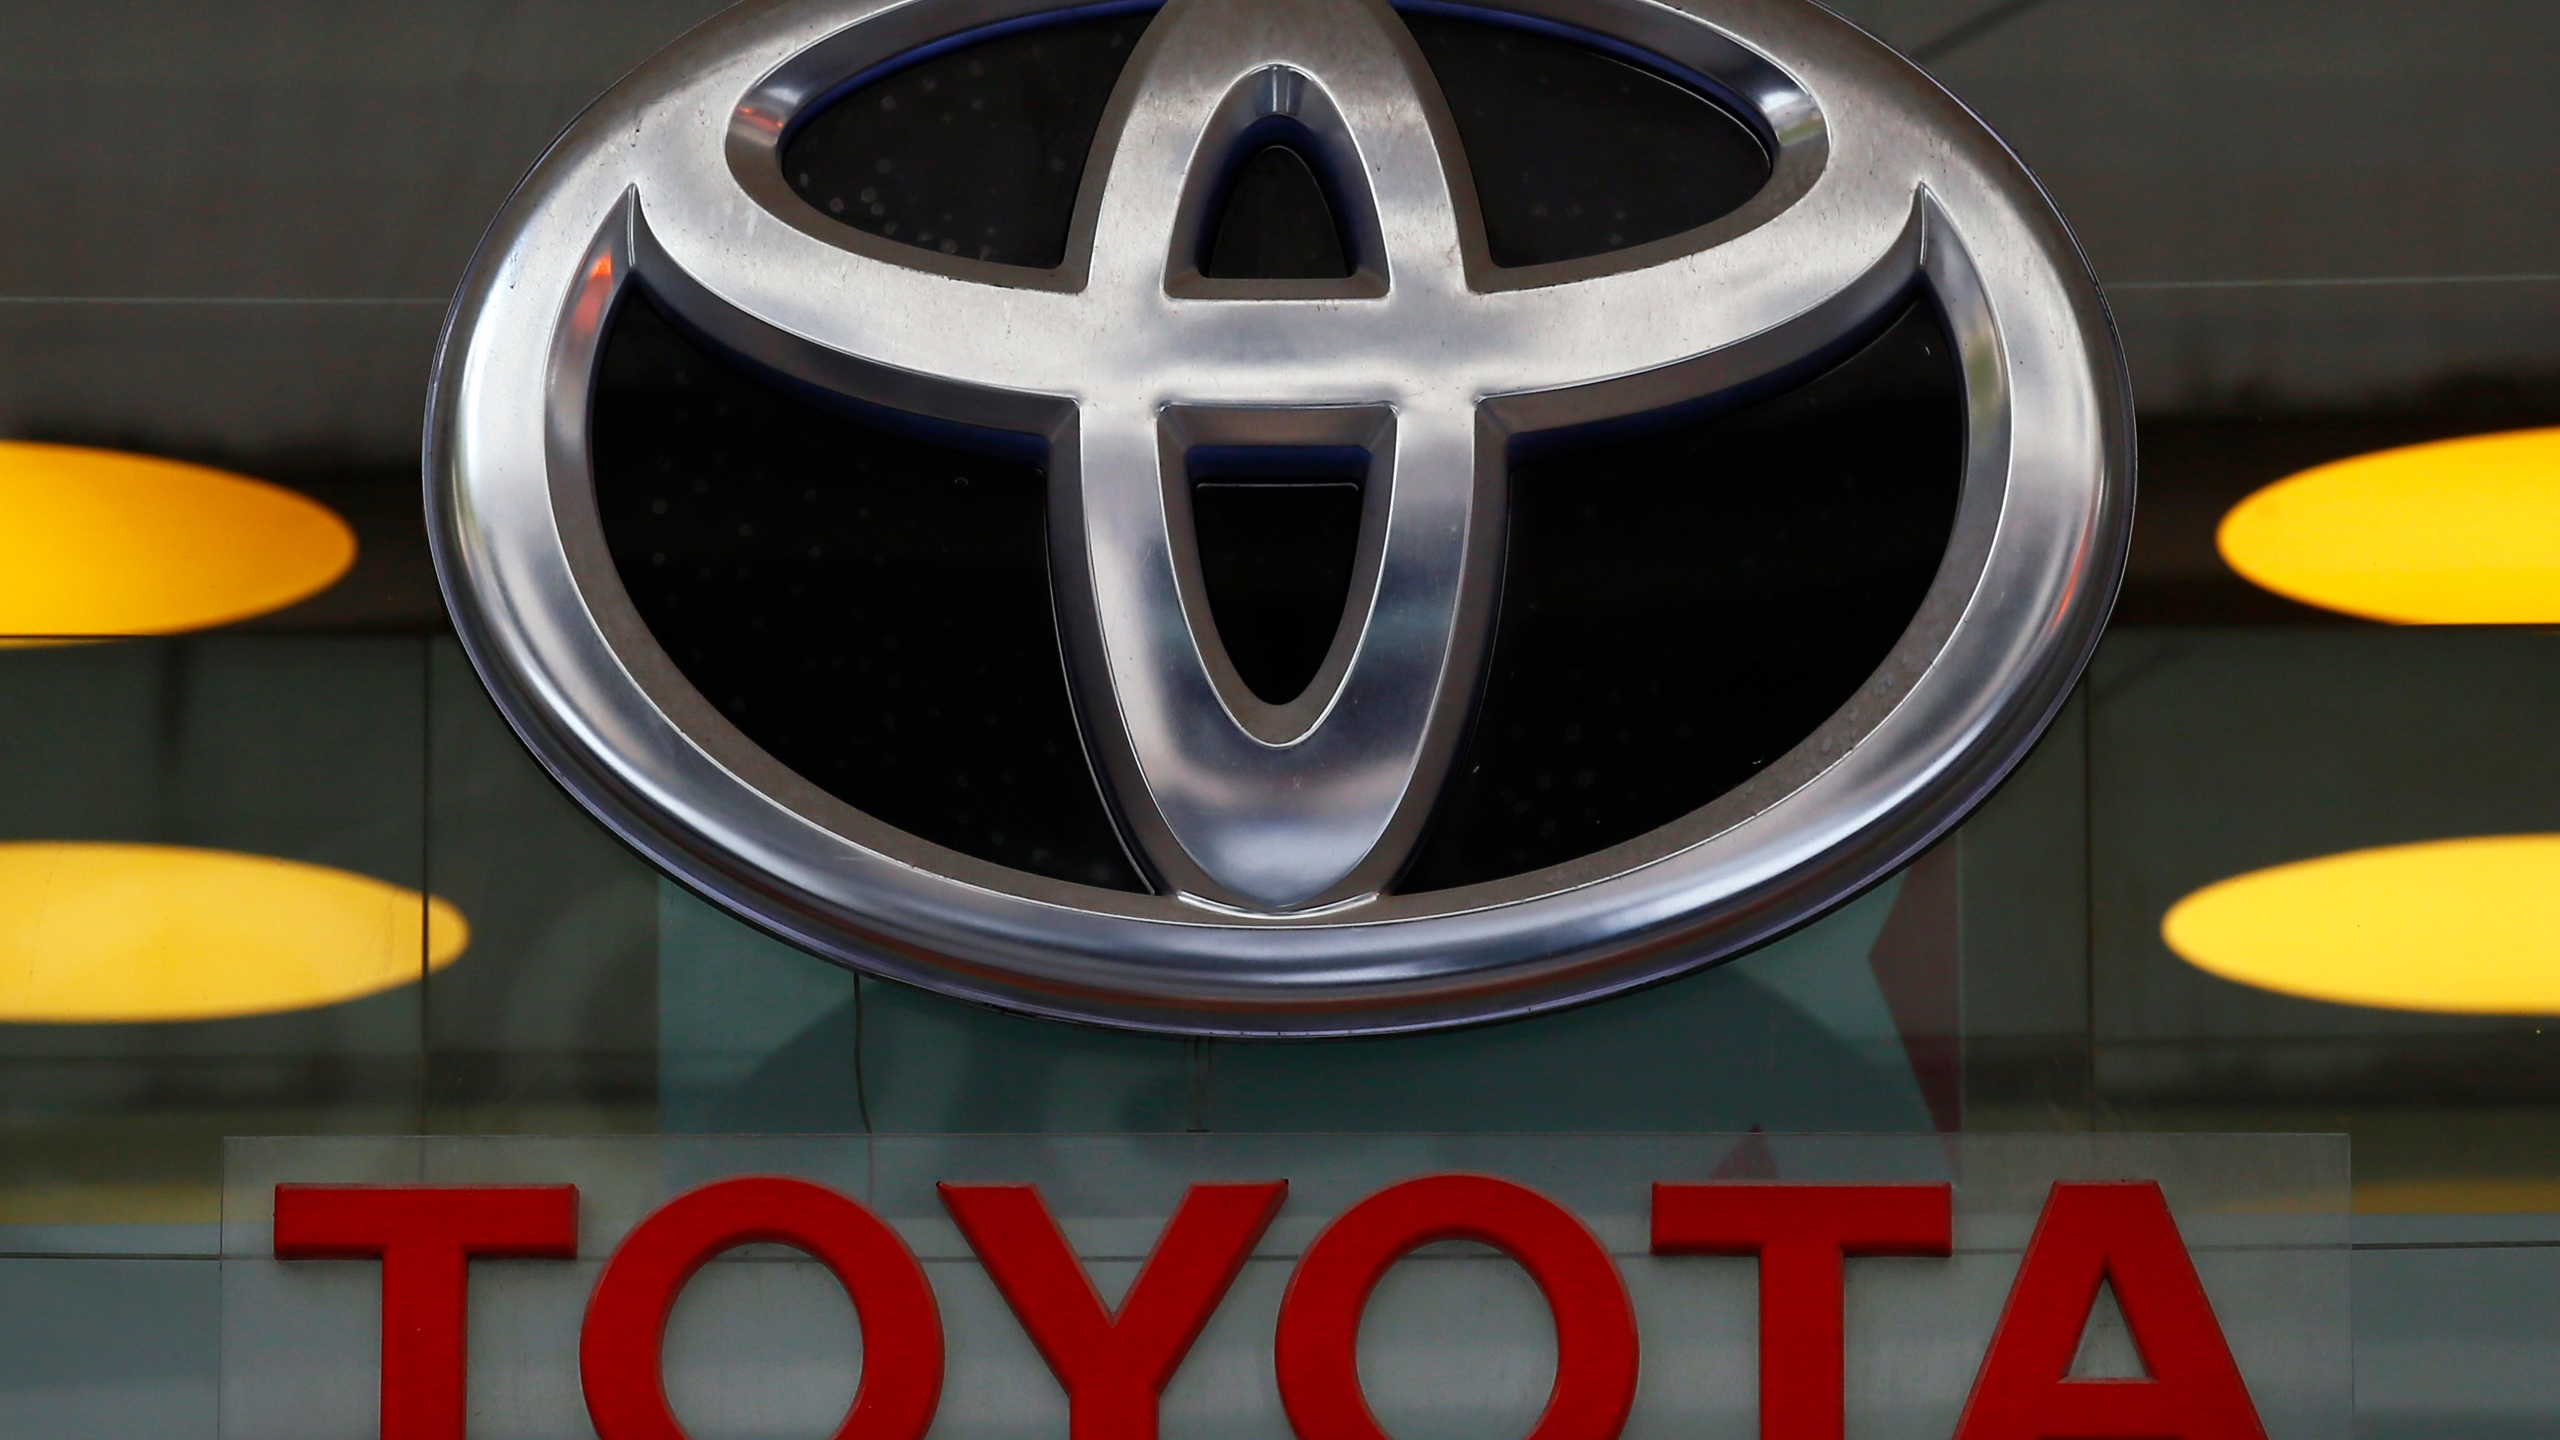 Toyota_Recall_73238-159532.jpg14899960